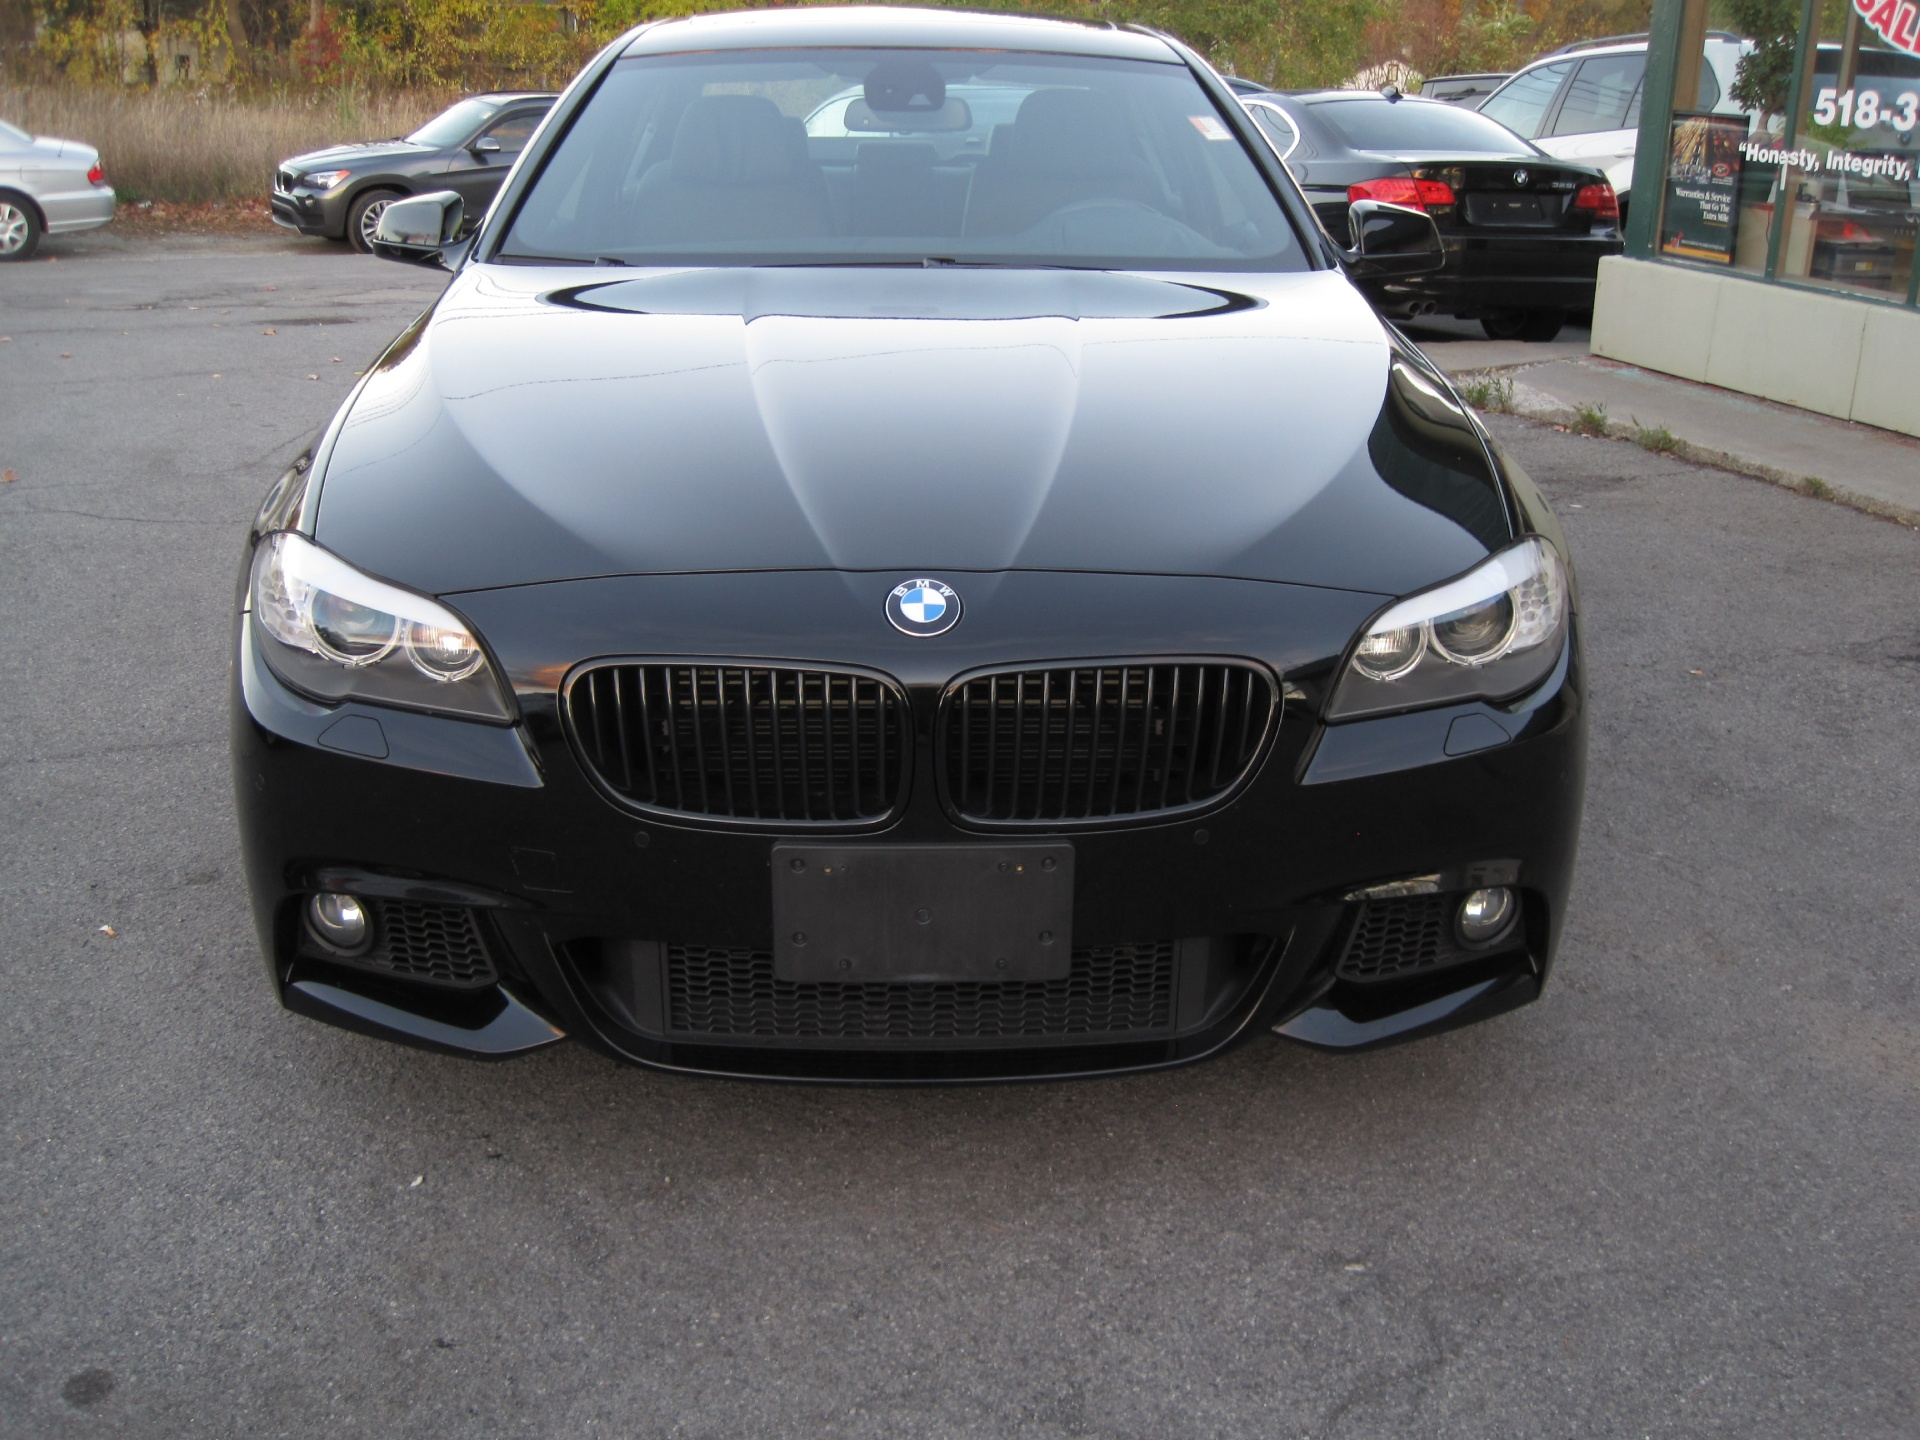 BMW Series I XDrive AWDSUPER LOADEDSUPER CLEANMSPORT - Bmw 550i sport package